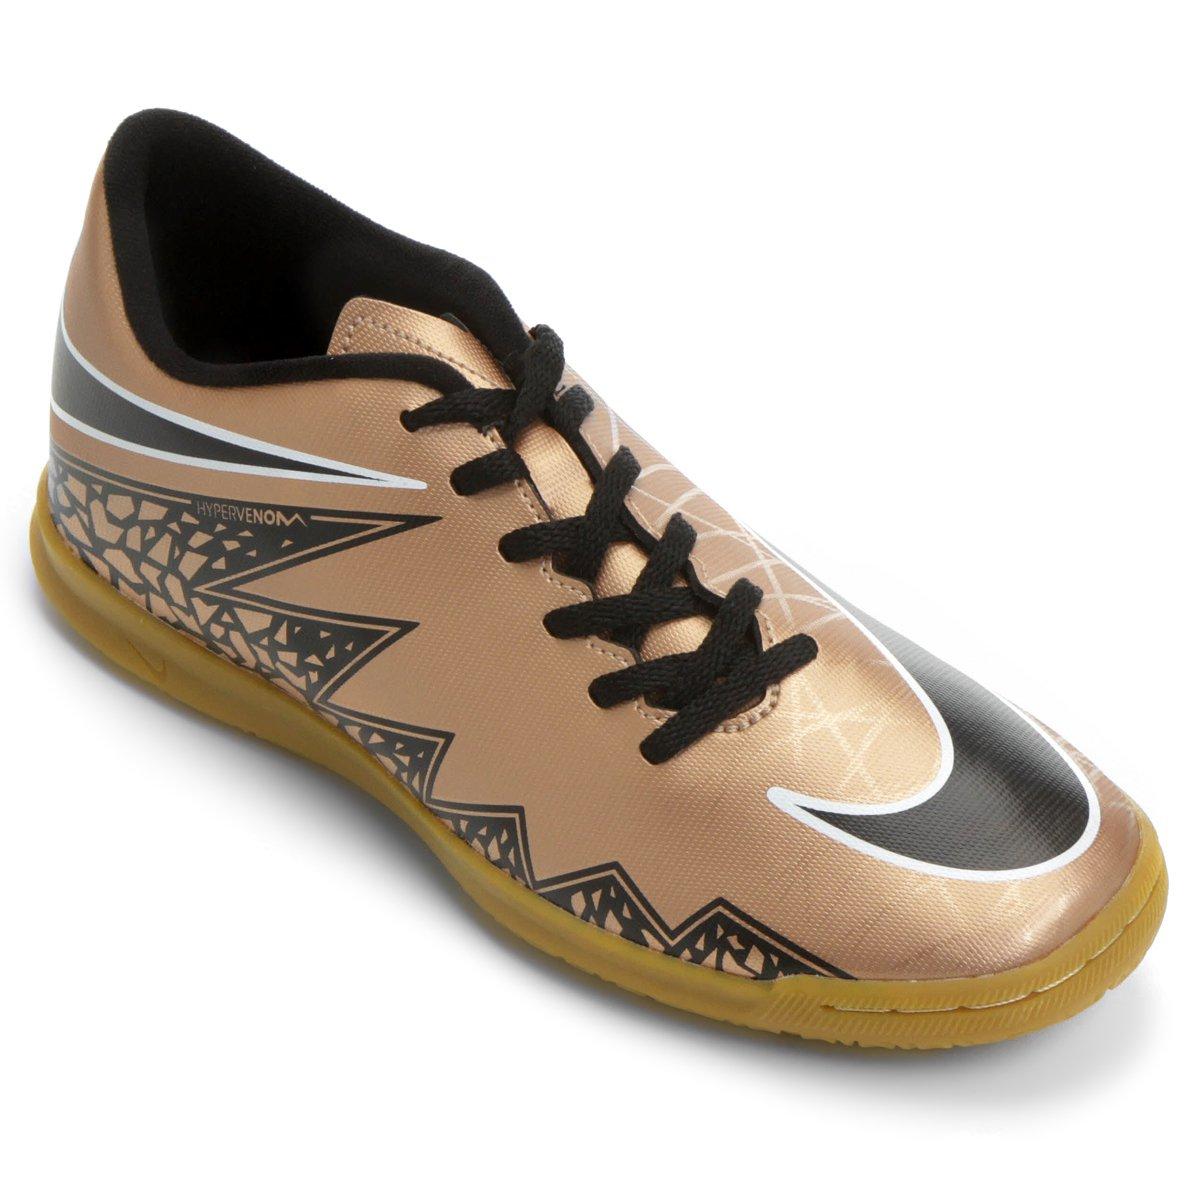 d4eb6f1d158eb Chuteira Nike Hypervenom Phade 2 IC Futsal - Marrom e Preto ...